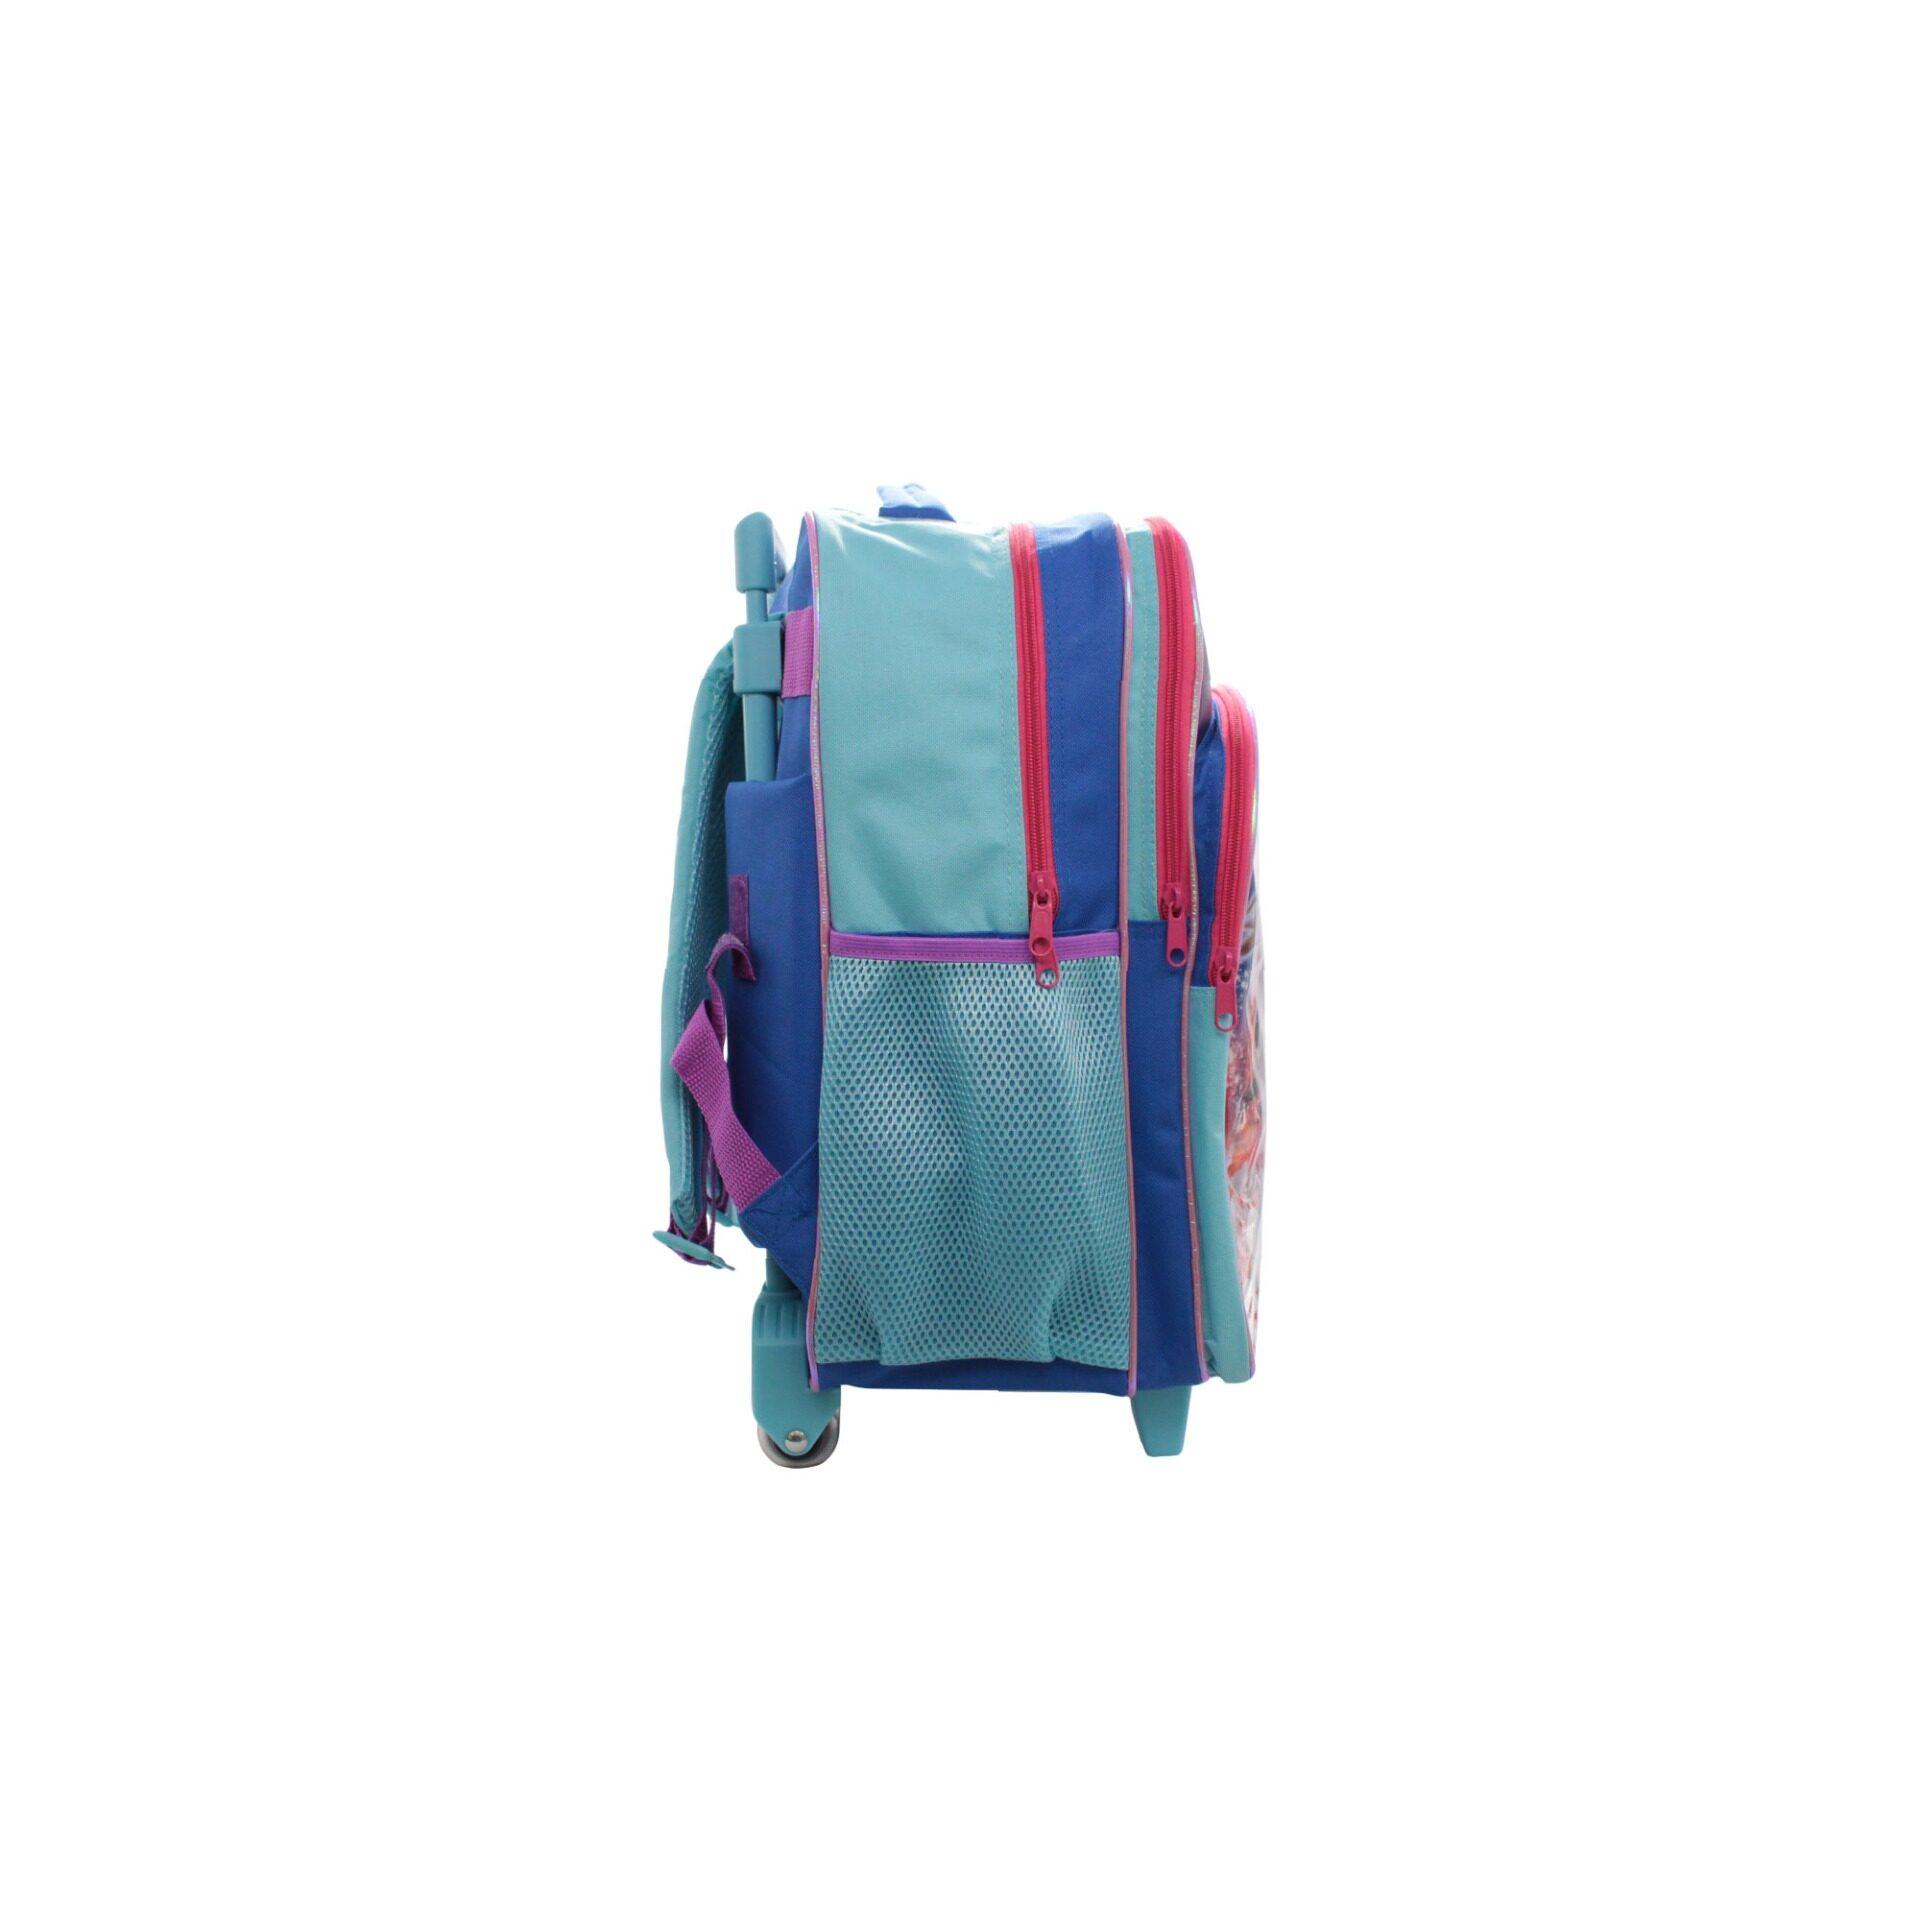 Disney Princess Frozen 2 Princess Elsa, Anna & Olaf Kids Girls Pre School Trolley Bag With 2 Wheels & Handle (Purple & Turqoise)